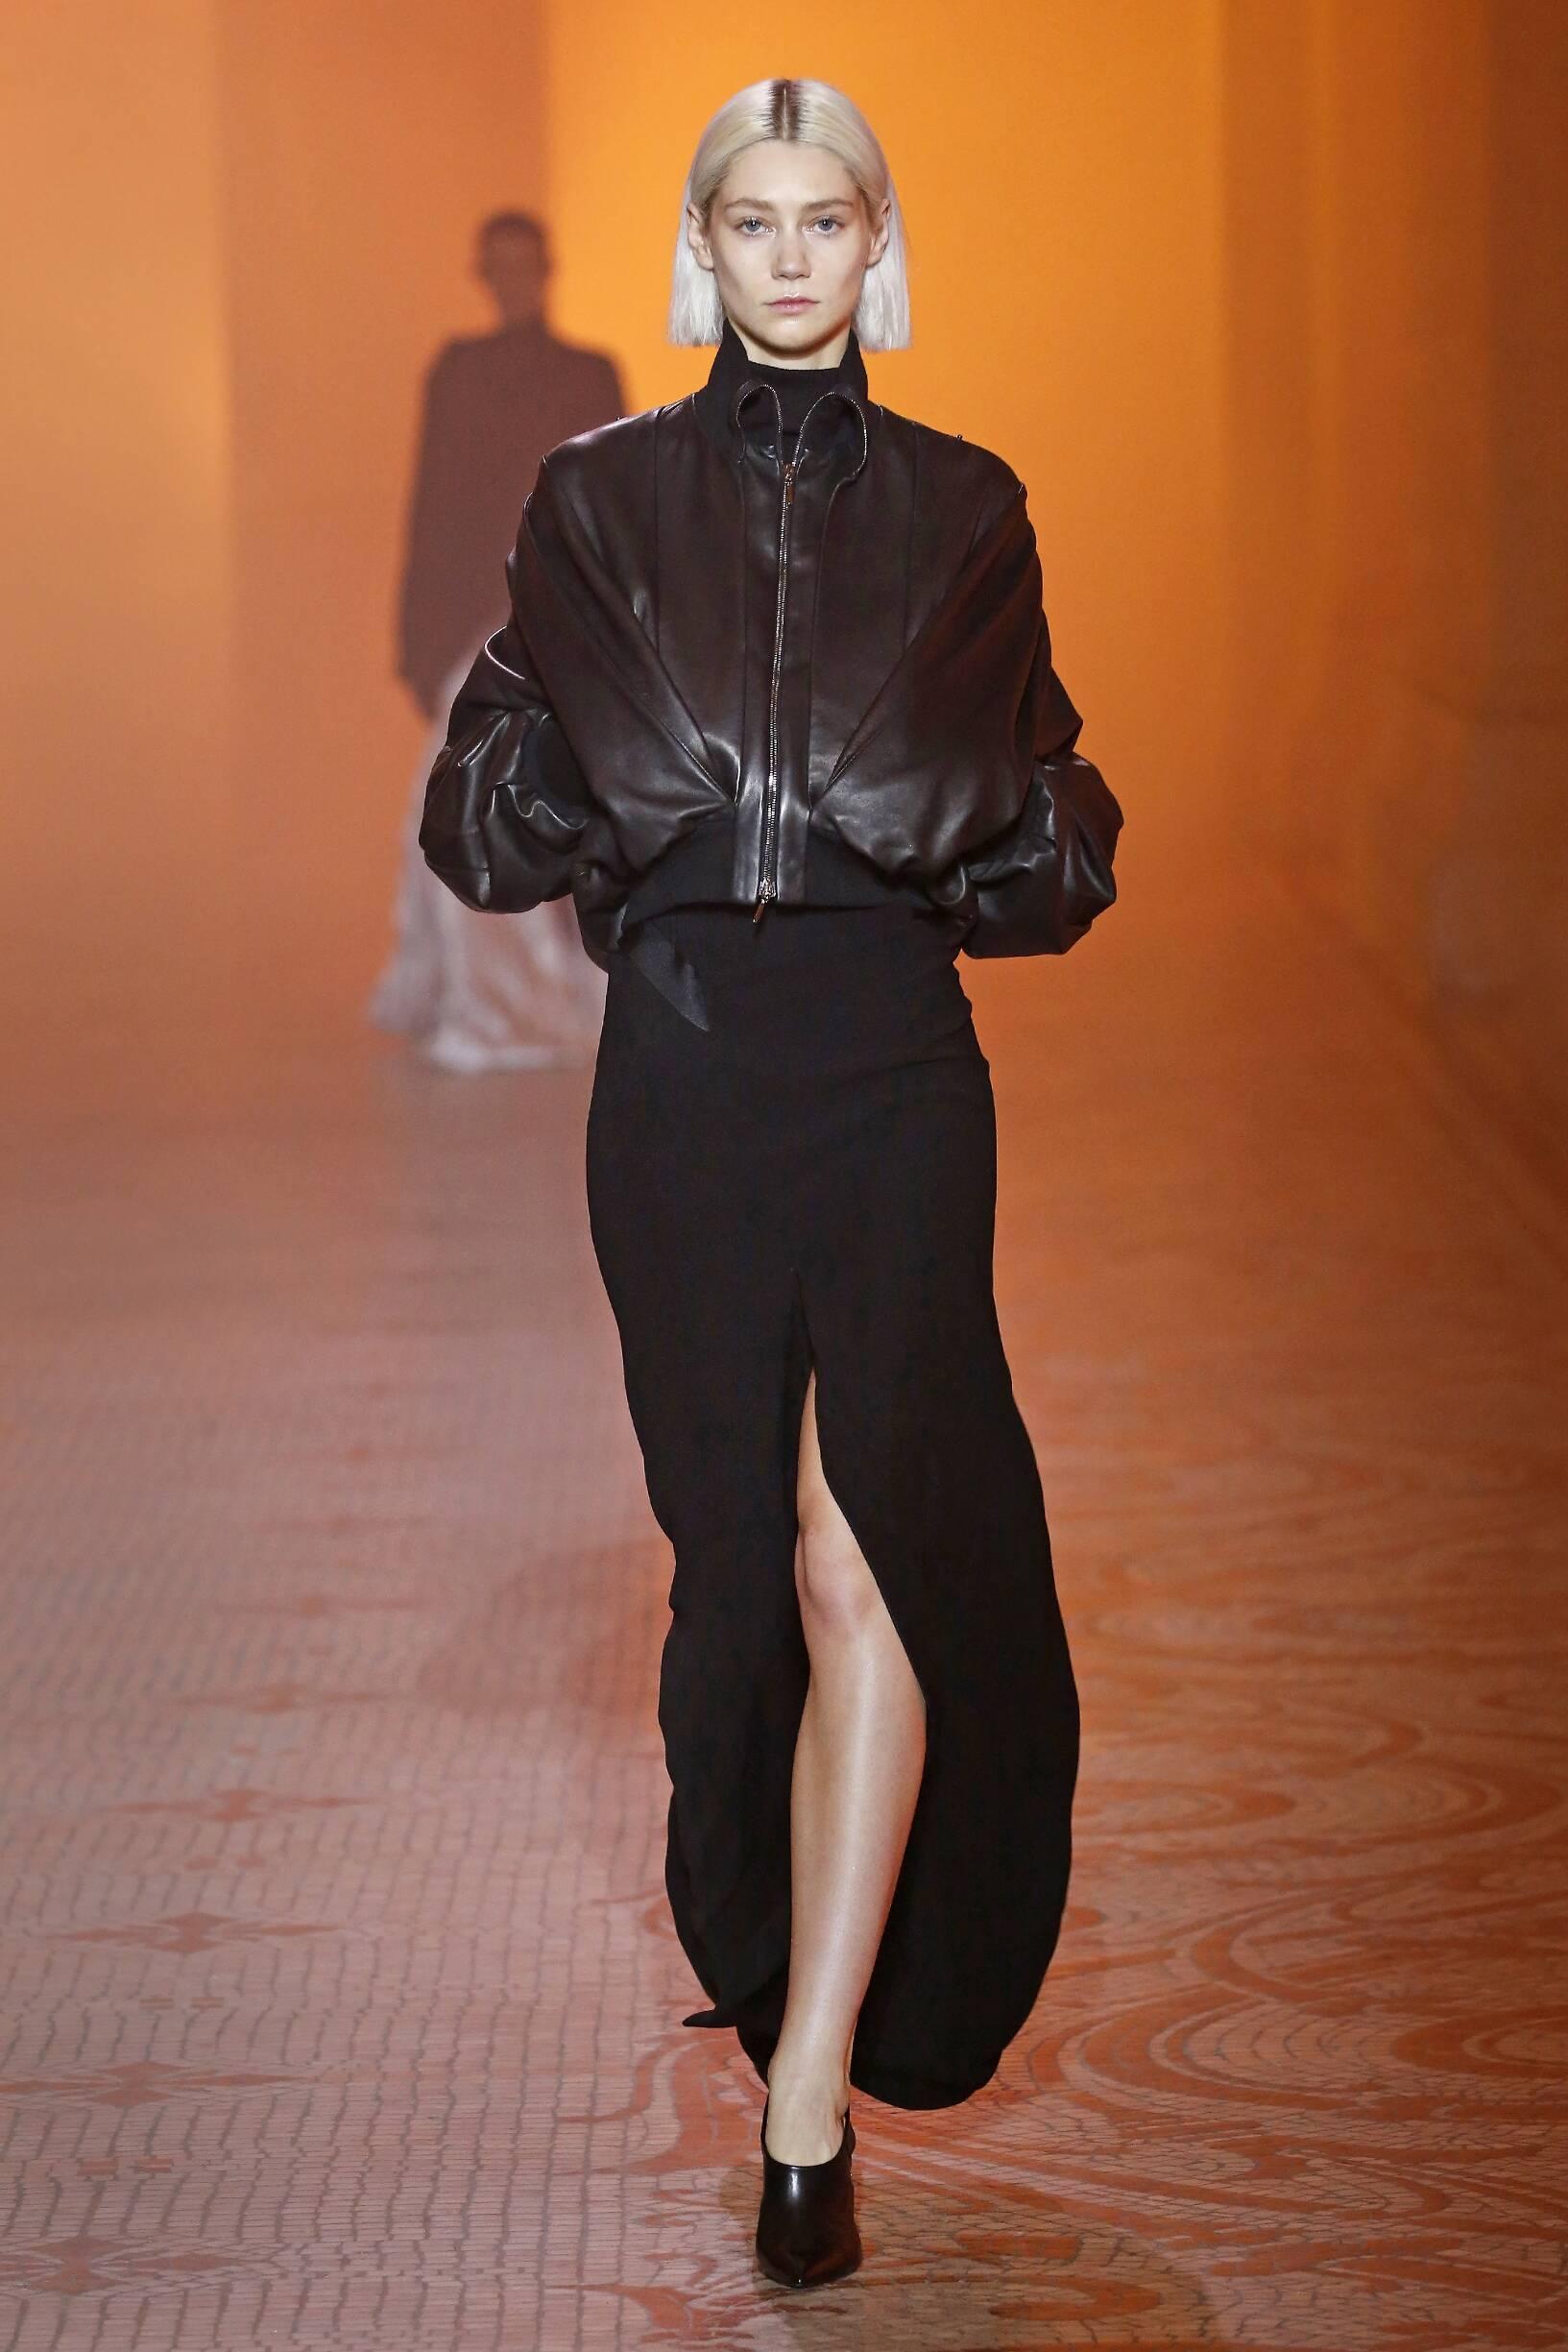 Fashion Woman Model Poiret Catwalk